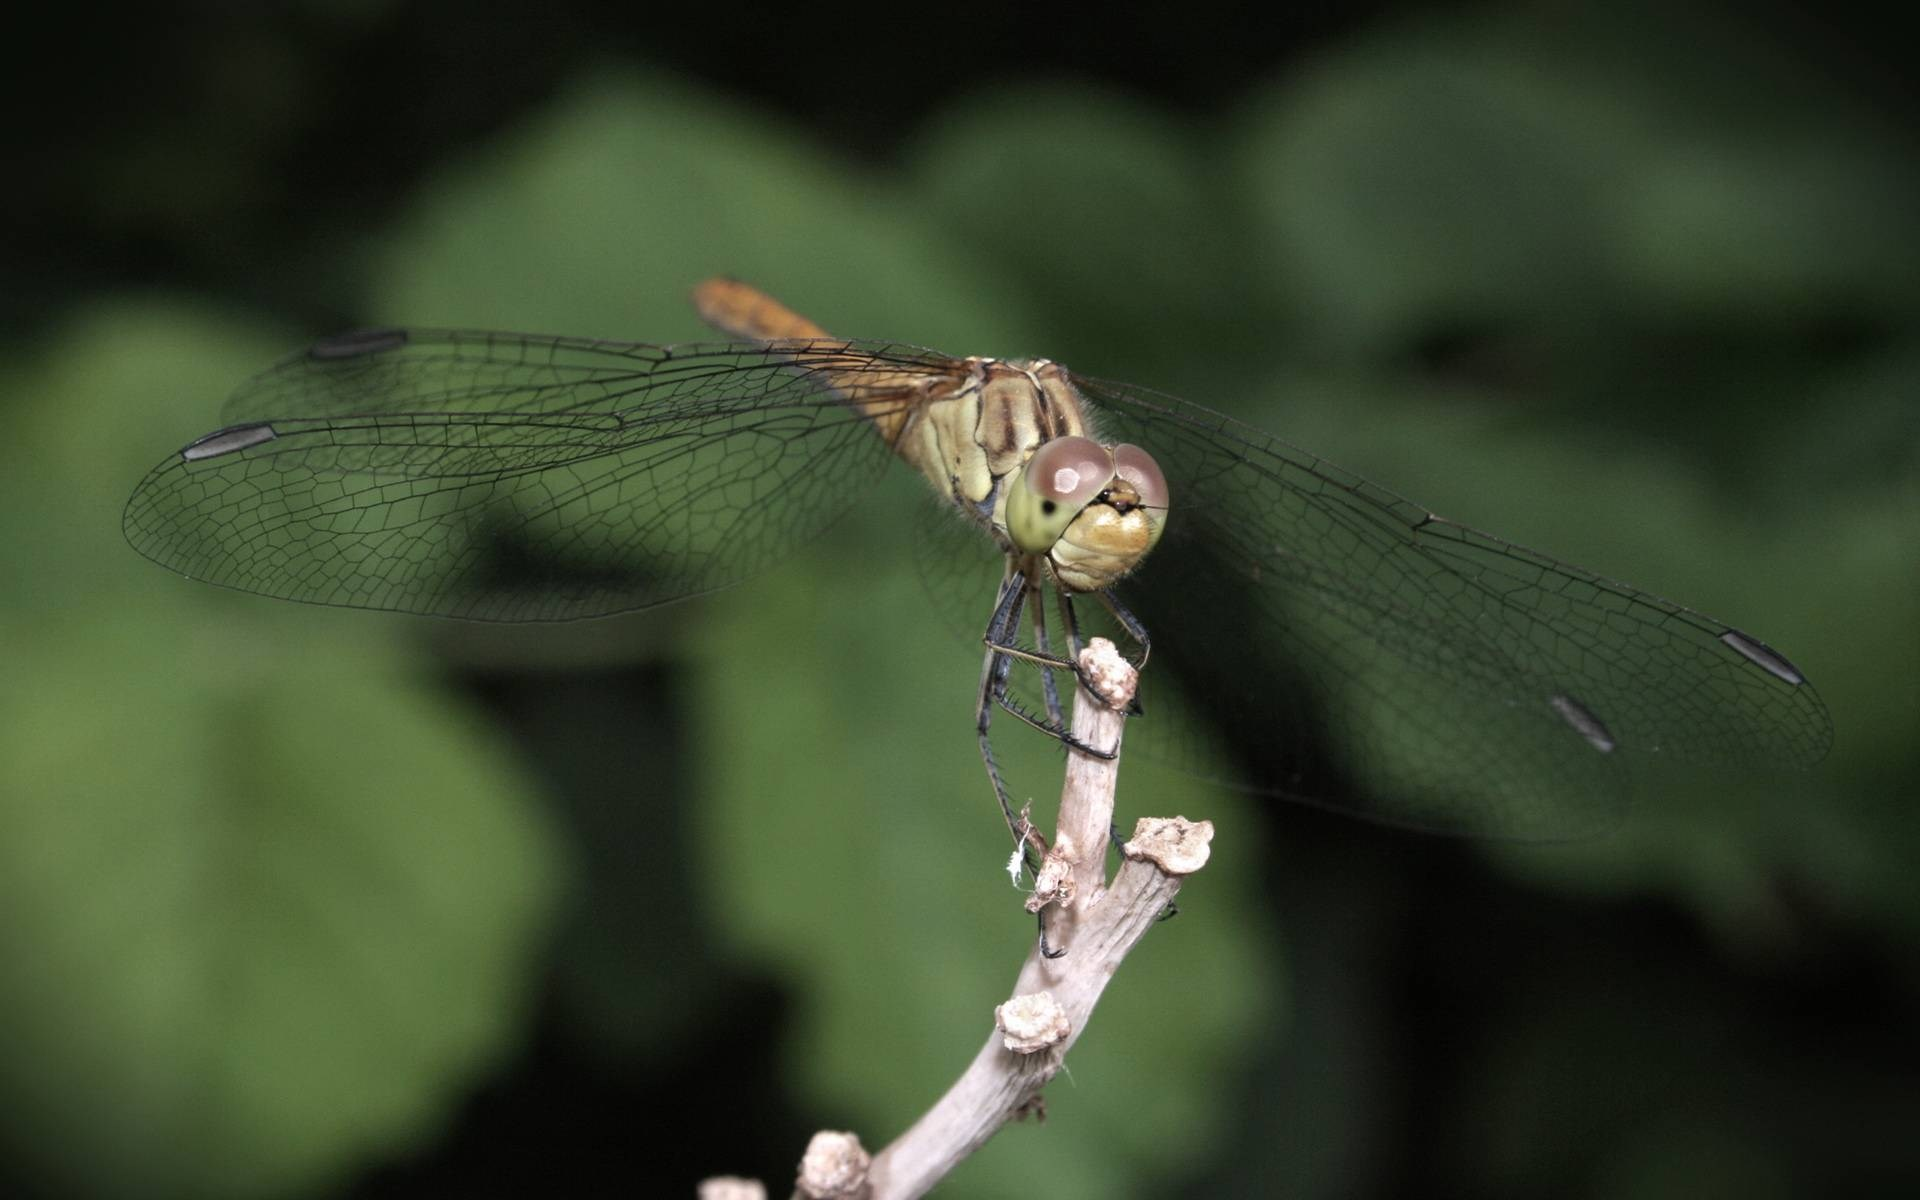 free-desktop-downloads-dragonfly-Delman-Bishop-wallpaper-wp3805537